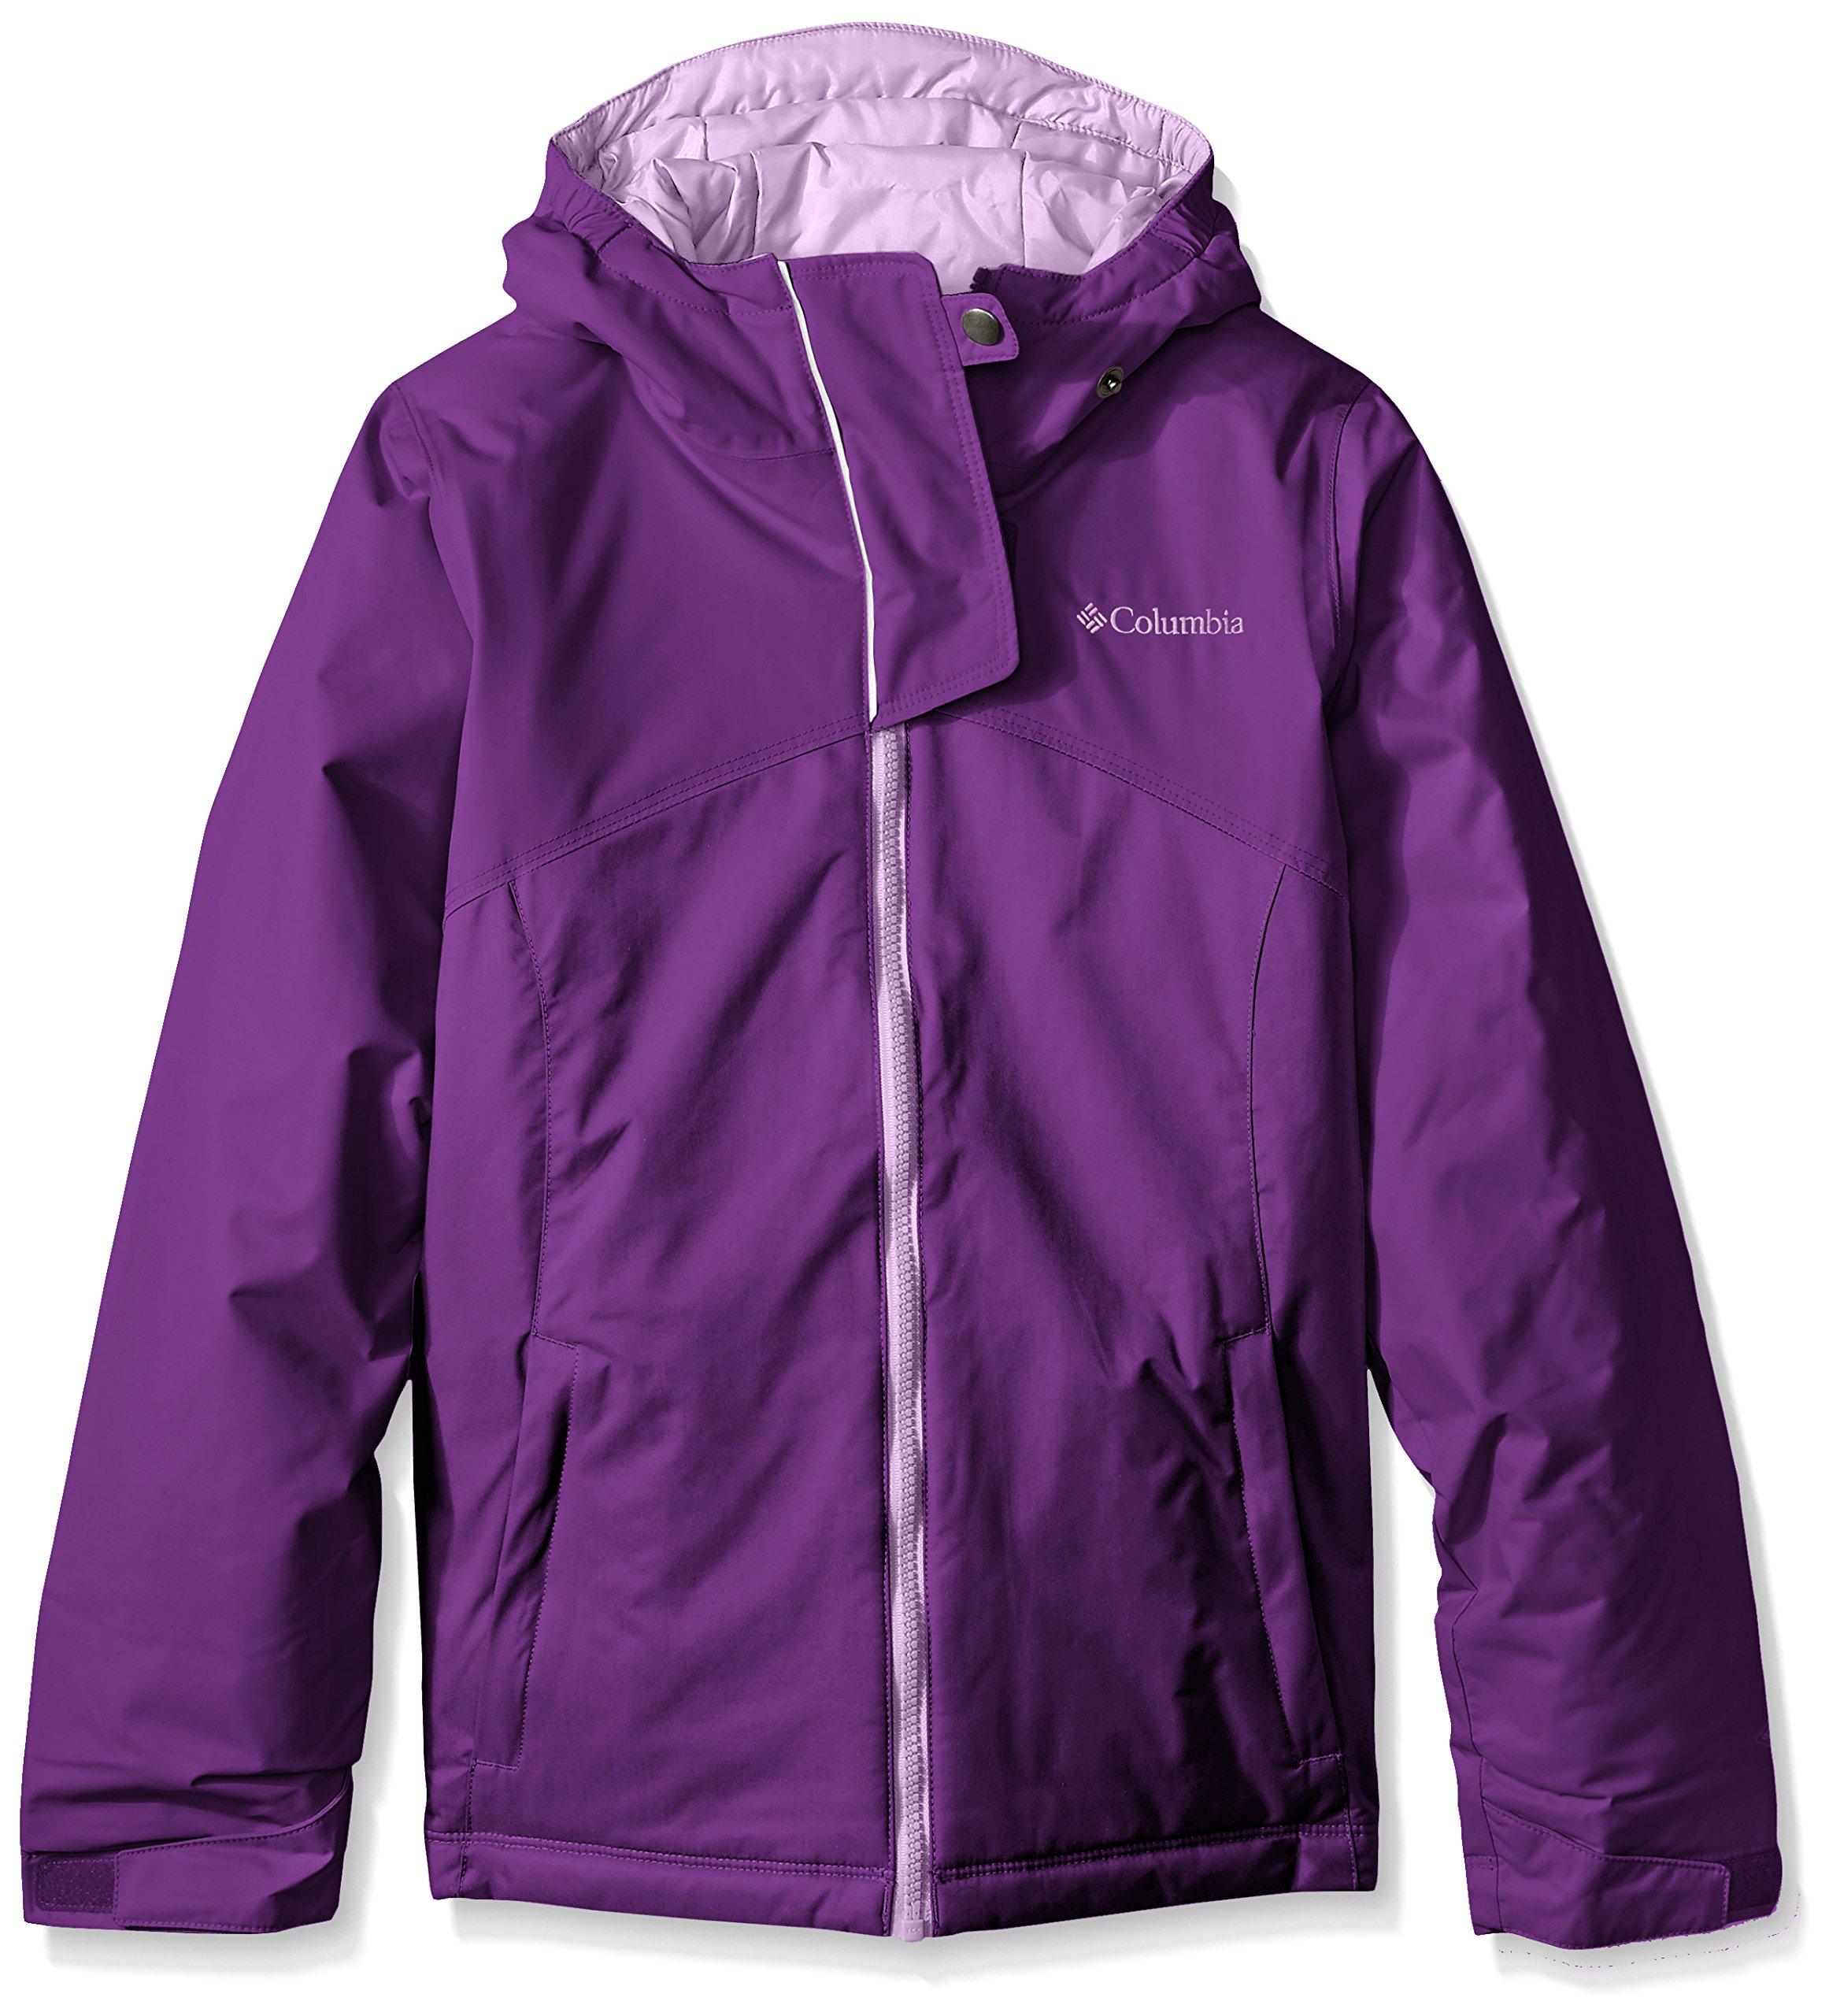 Columbia Girls Crash Course Jacket, Medium, Iris Glow